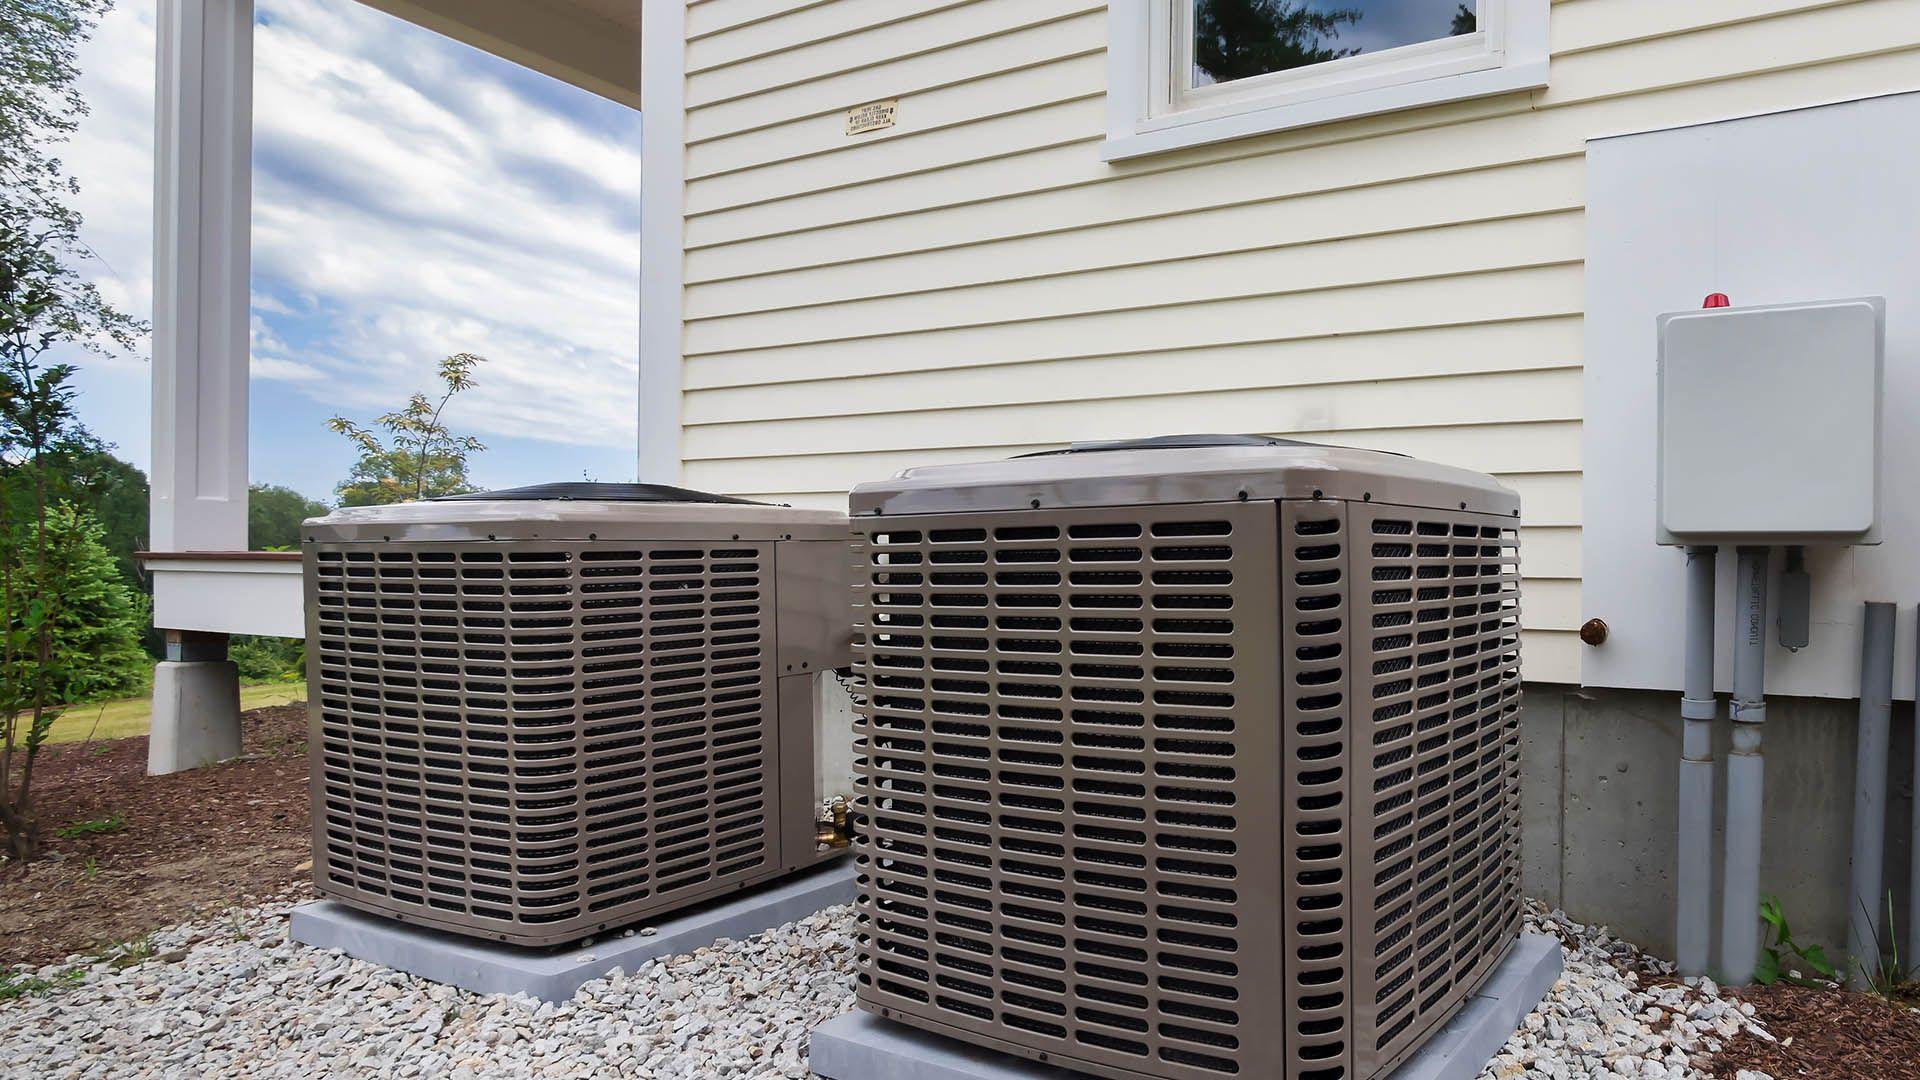 Furnace installation, Air conditioner, Hvac installation